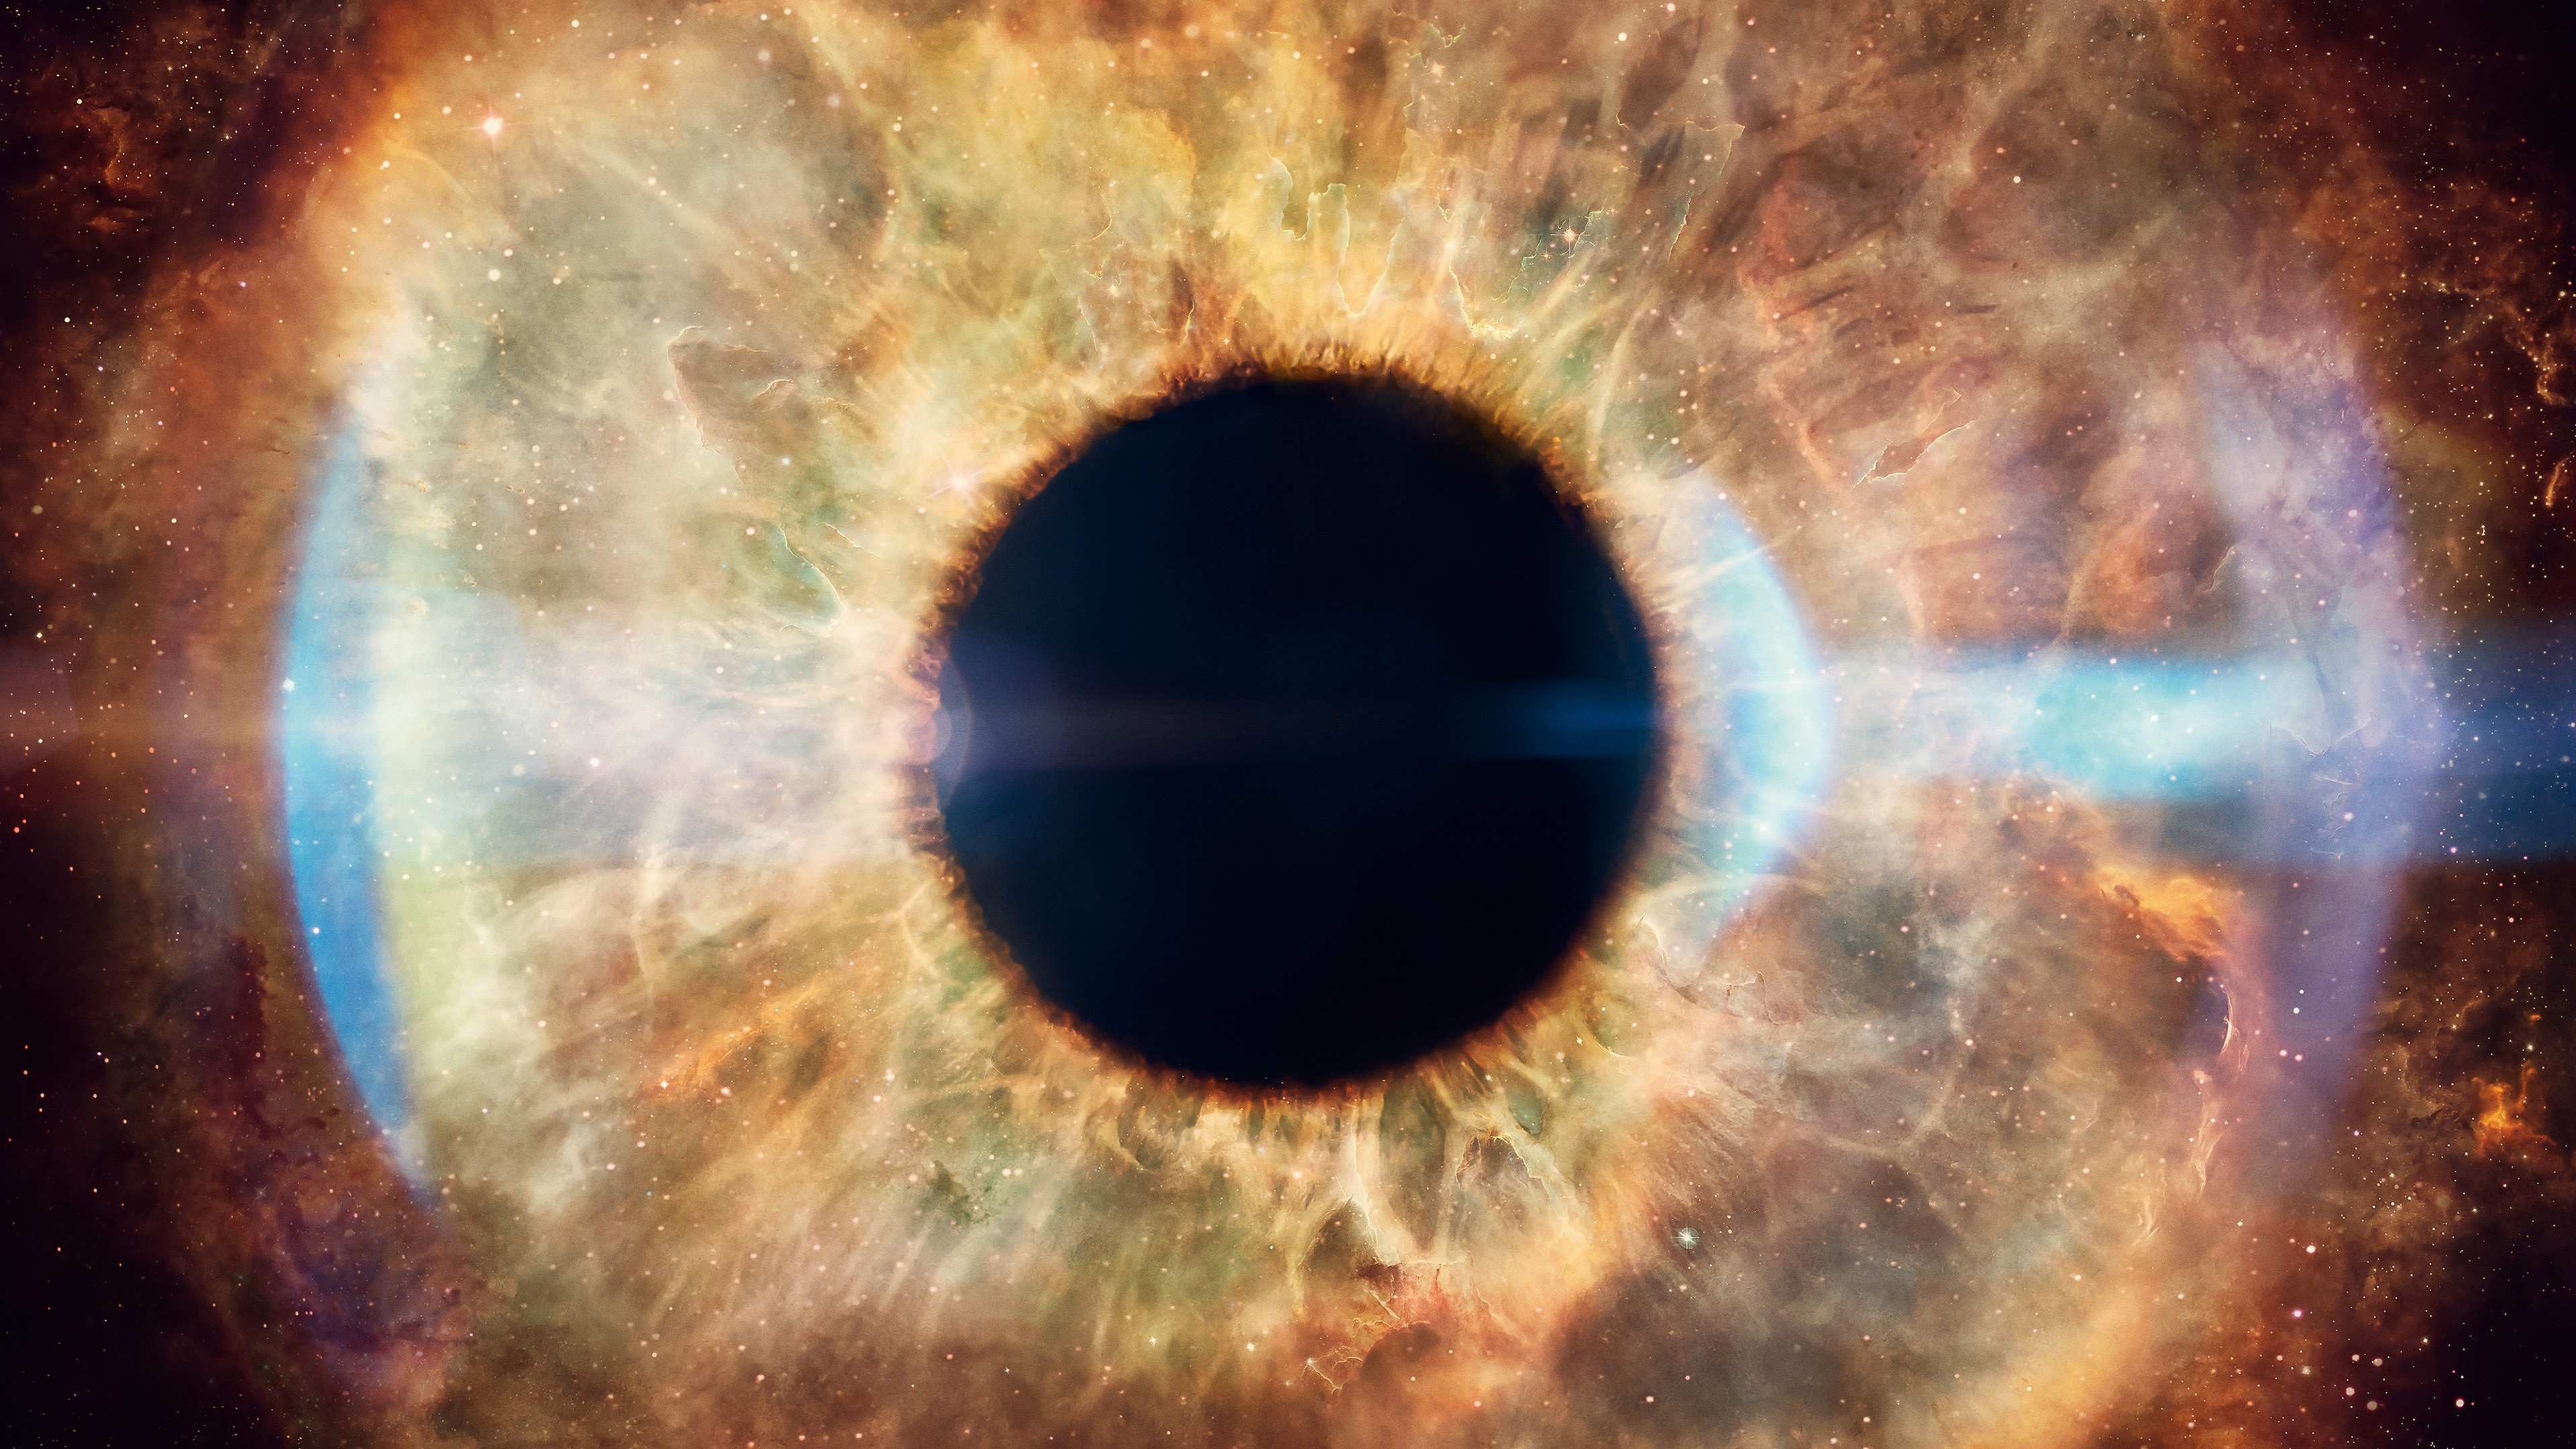 Картинки для глаз бога